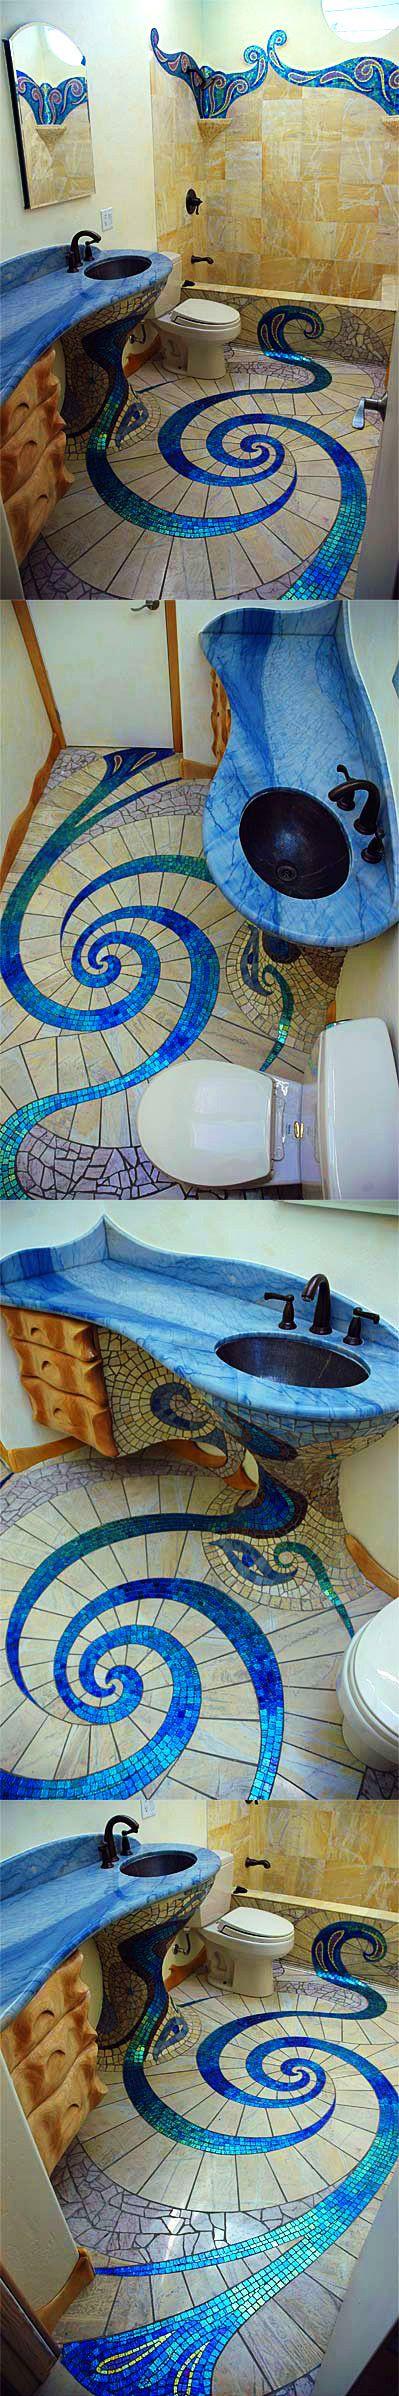 Awesome bathroom floor design.